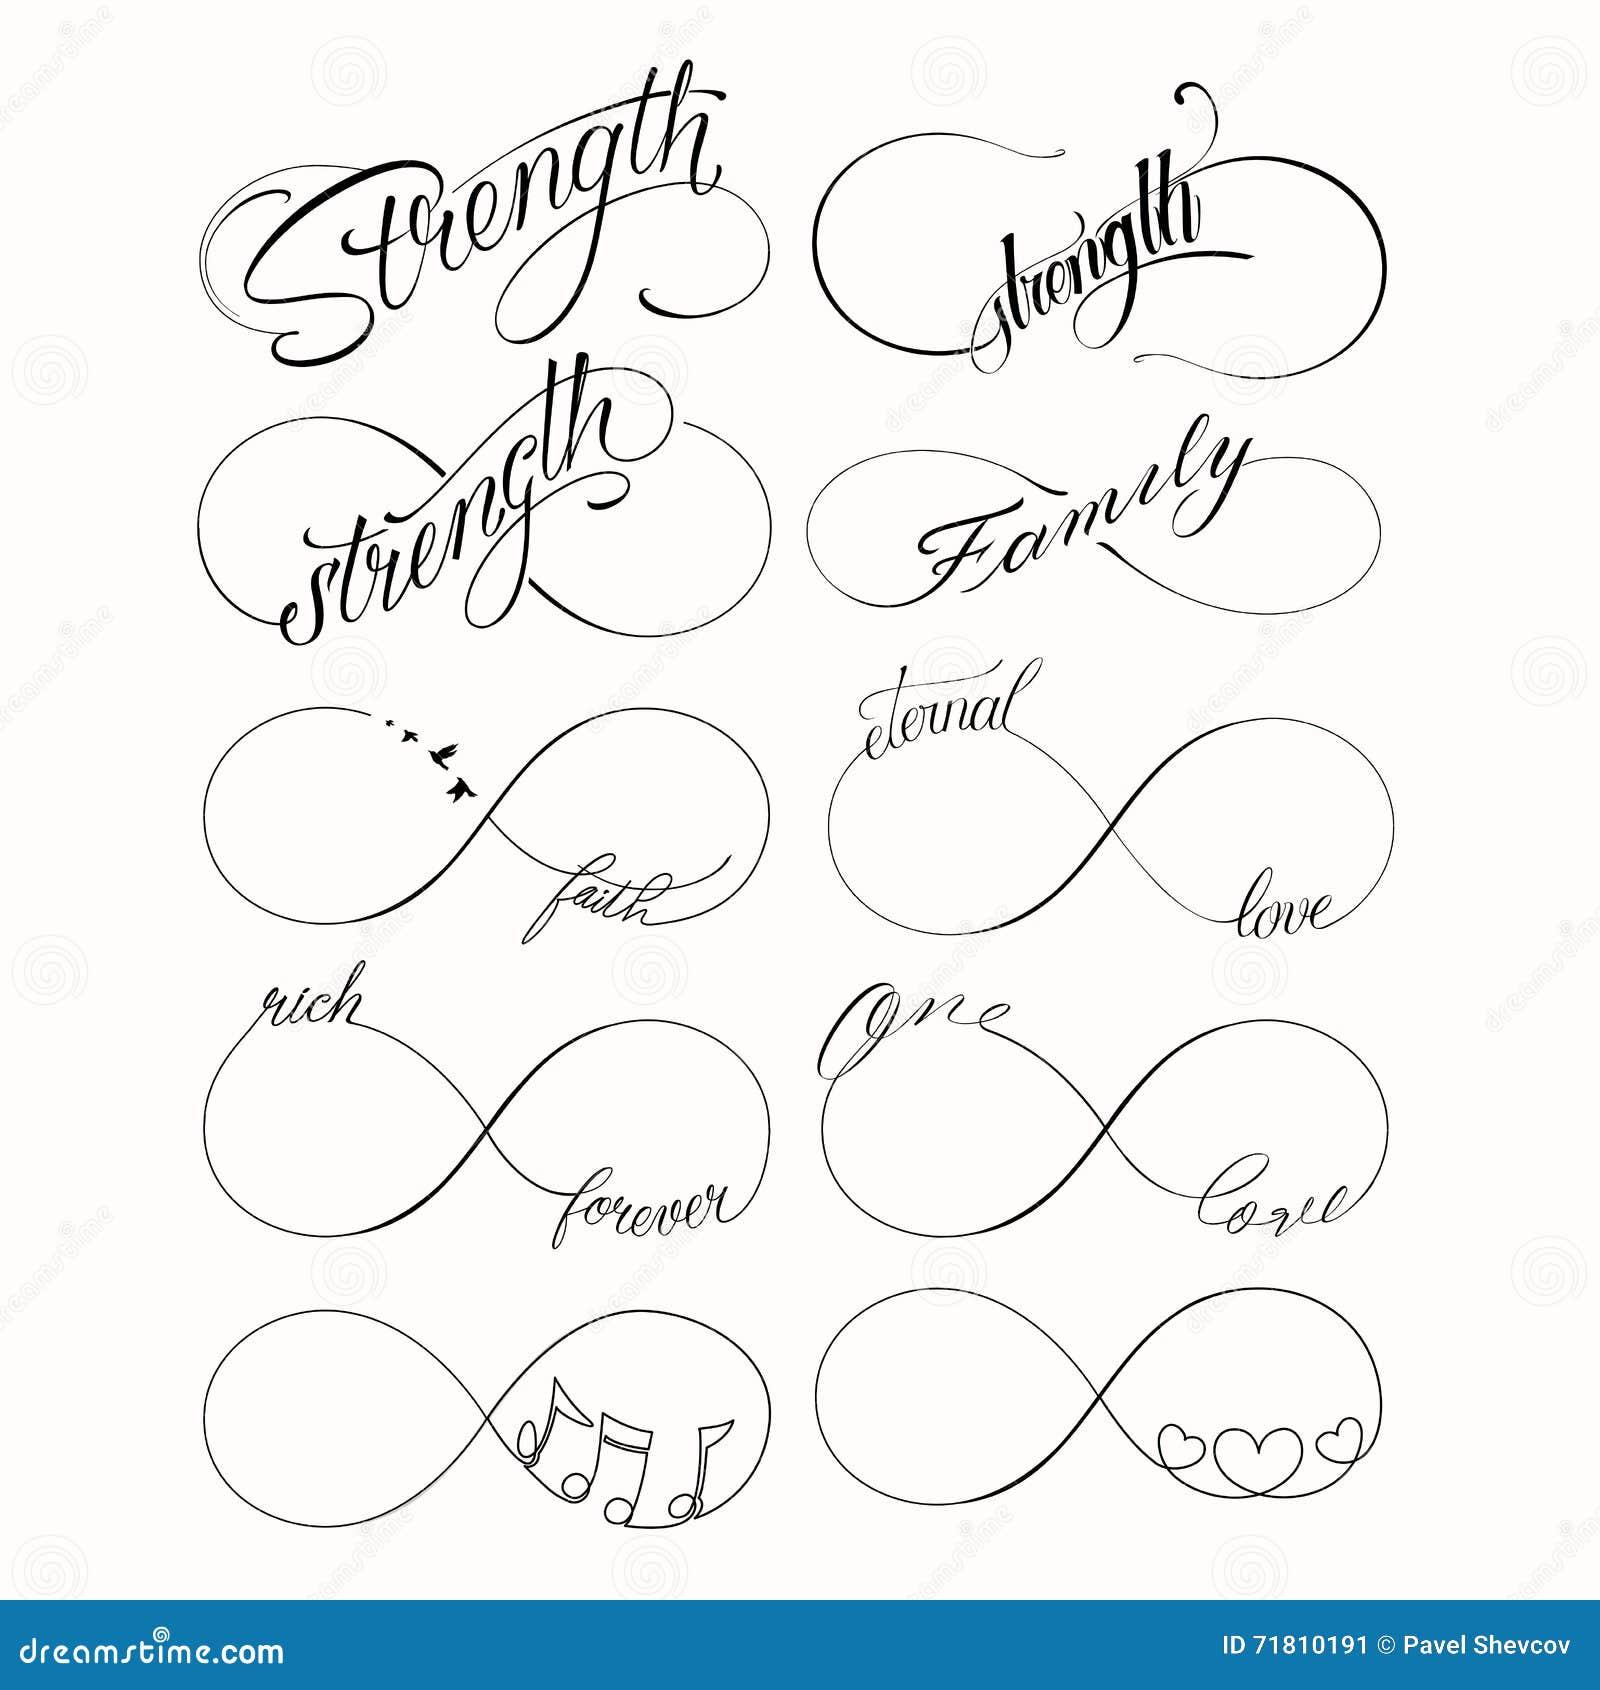 popular infinite tattoo set stock vector illustration of. Black Bedroom Furniture Sets. Home Design Ideas